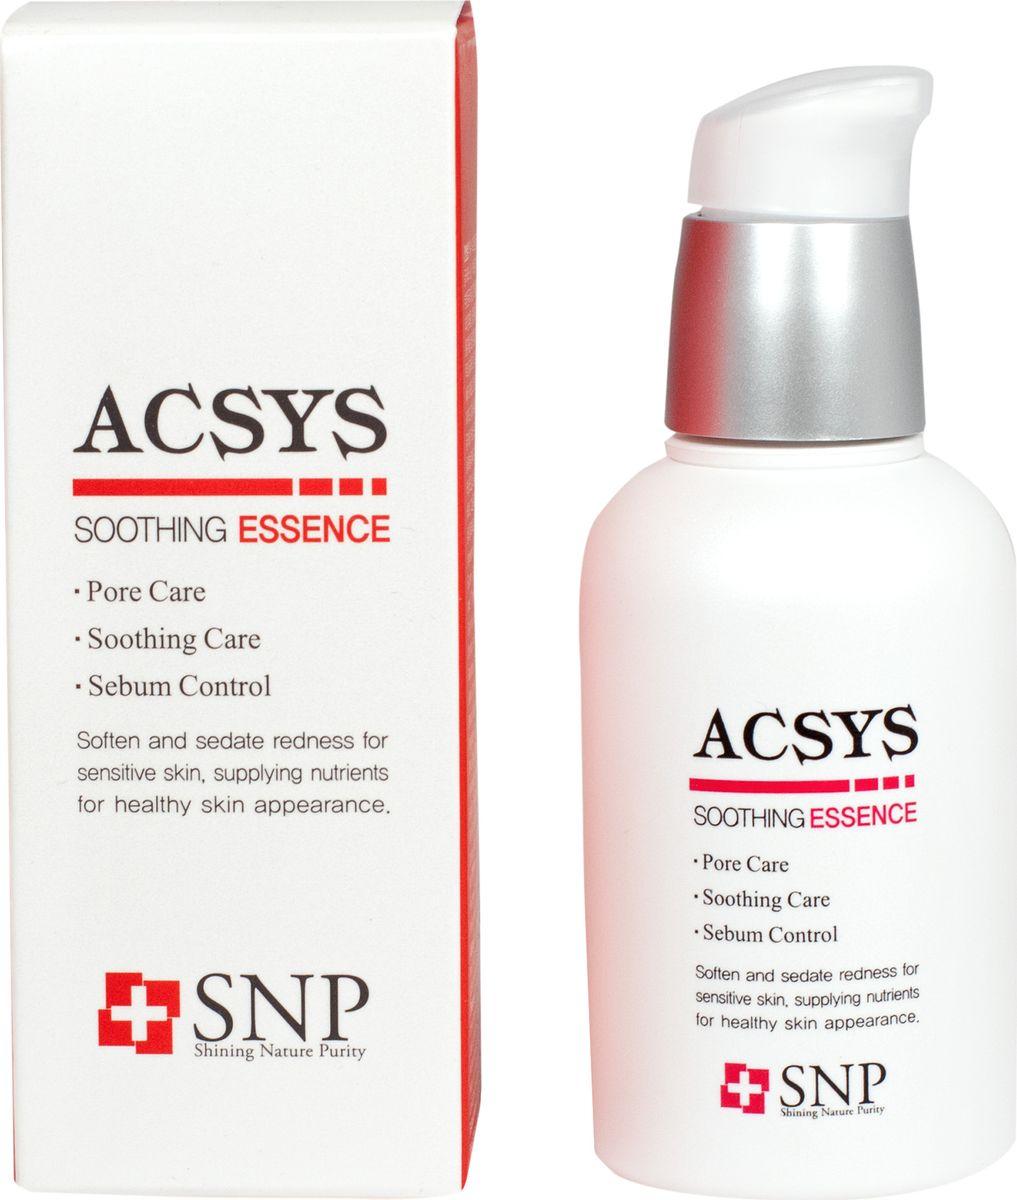 SNP ACSYS Soothing Essence Успокаивающая эссенция, 50 мл эссенция для лица 30 мл arsoa эссенция для лица 30 мл